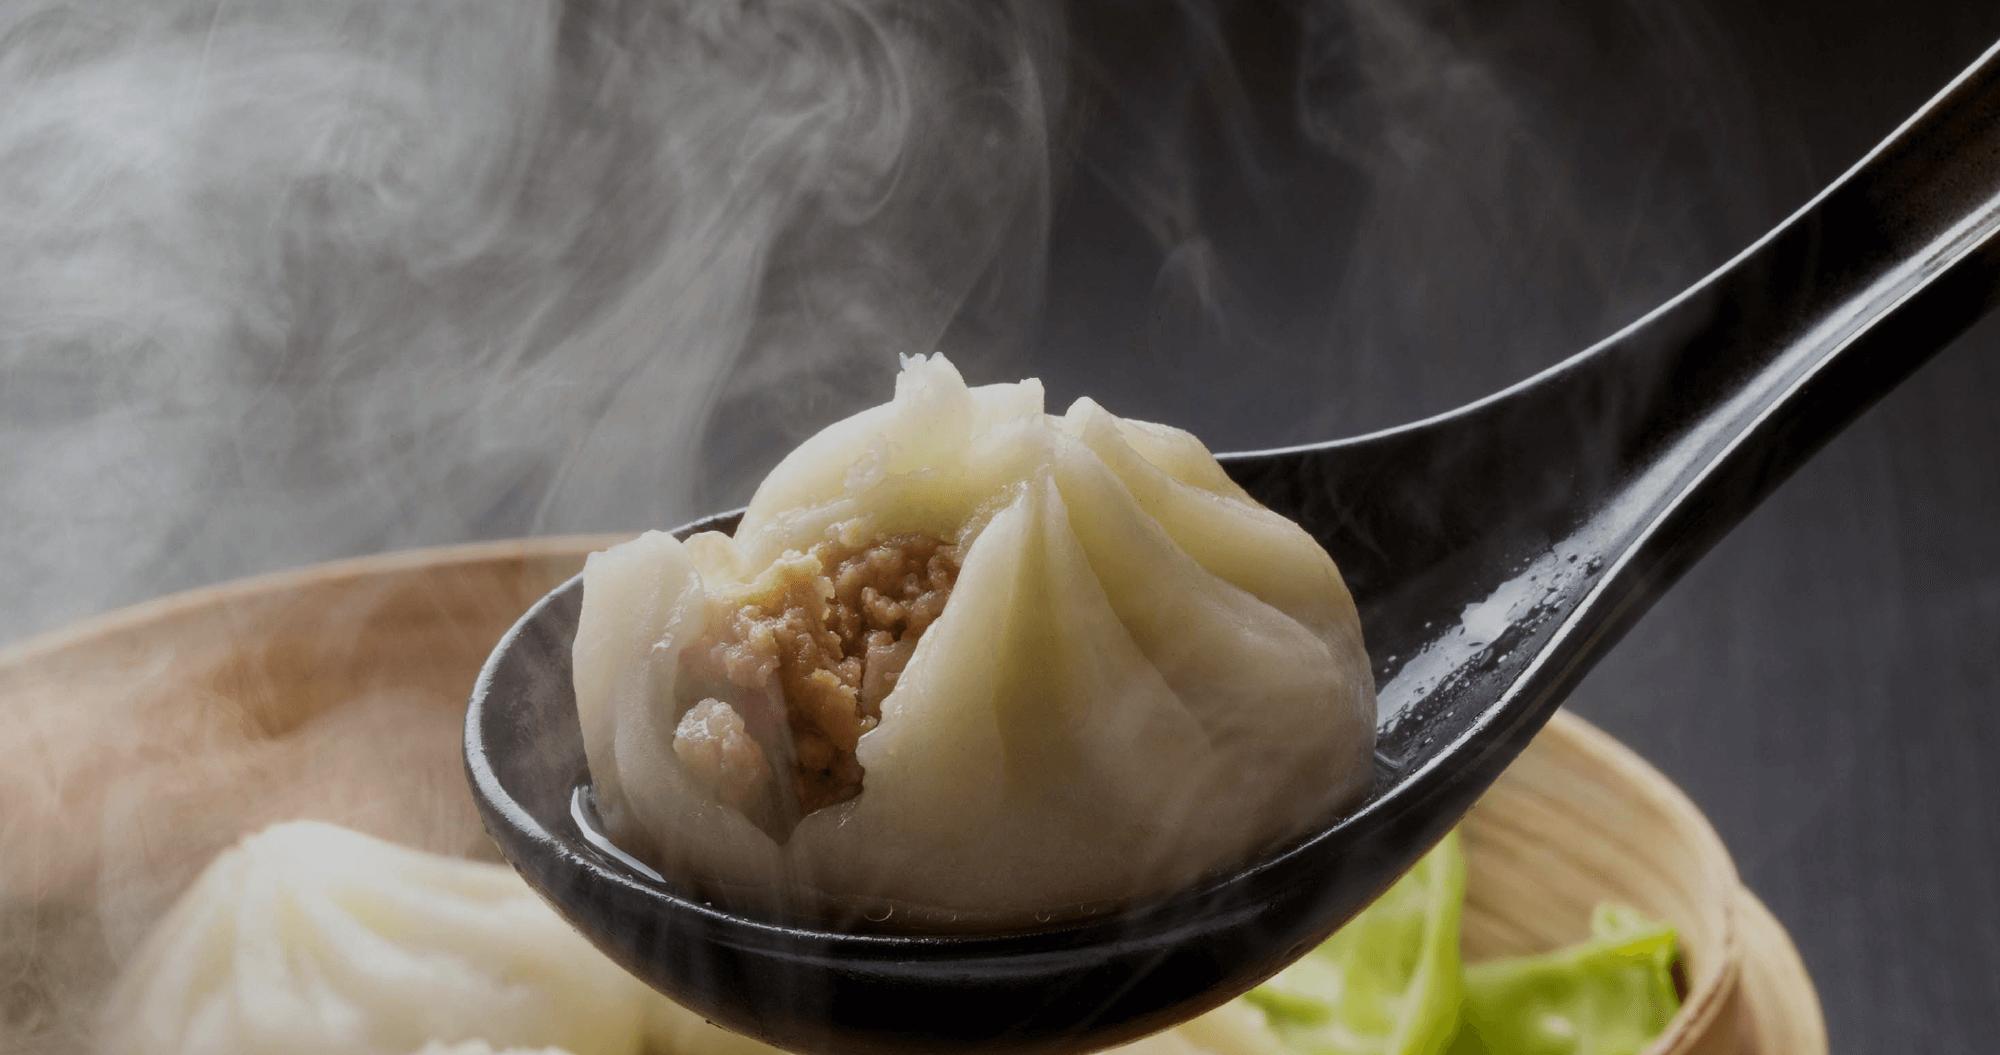 佐貫・龍ケ崎居酒屋|麺's BAR 叶多寿|佐貫居酒屋バル